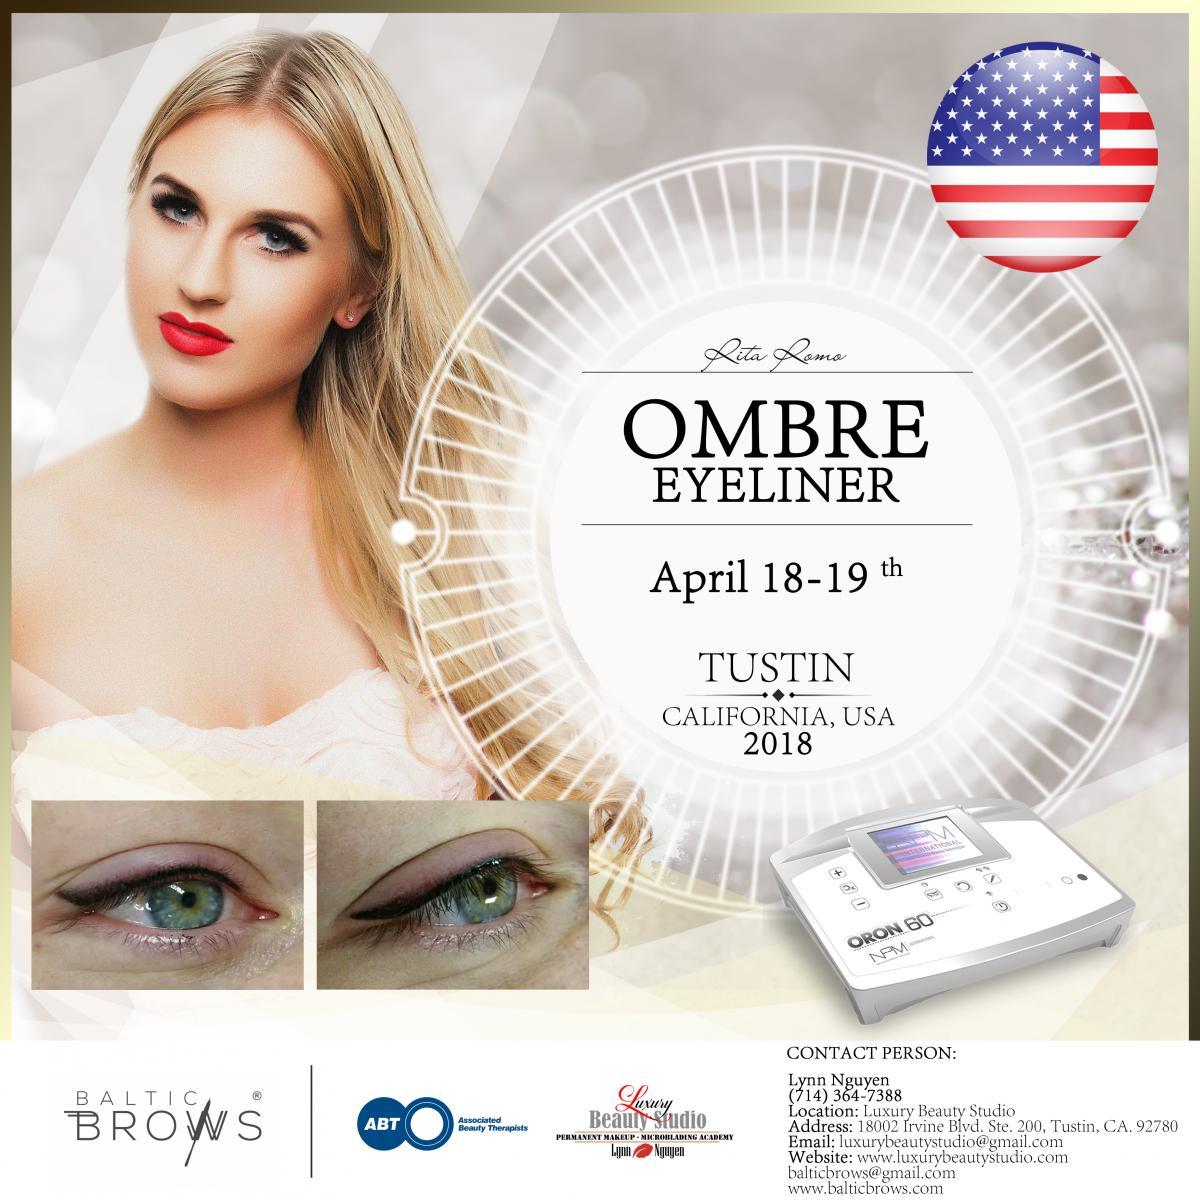 Ombre eyeliner machine